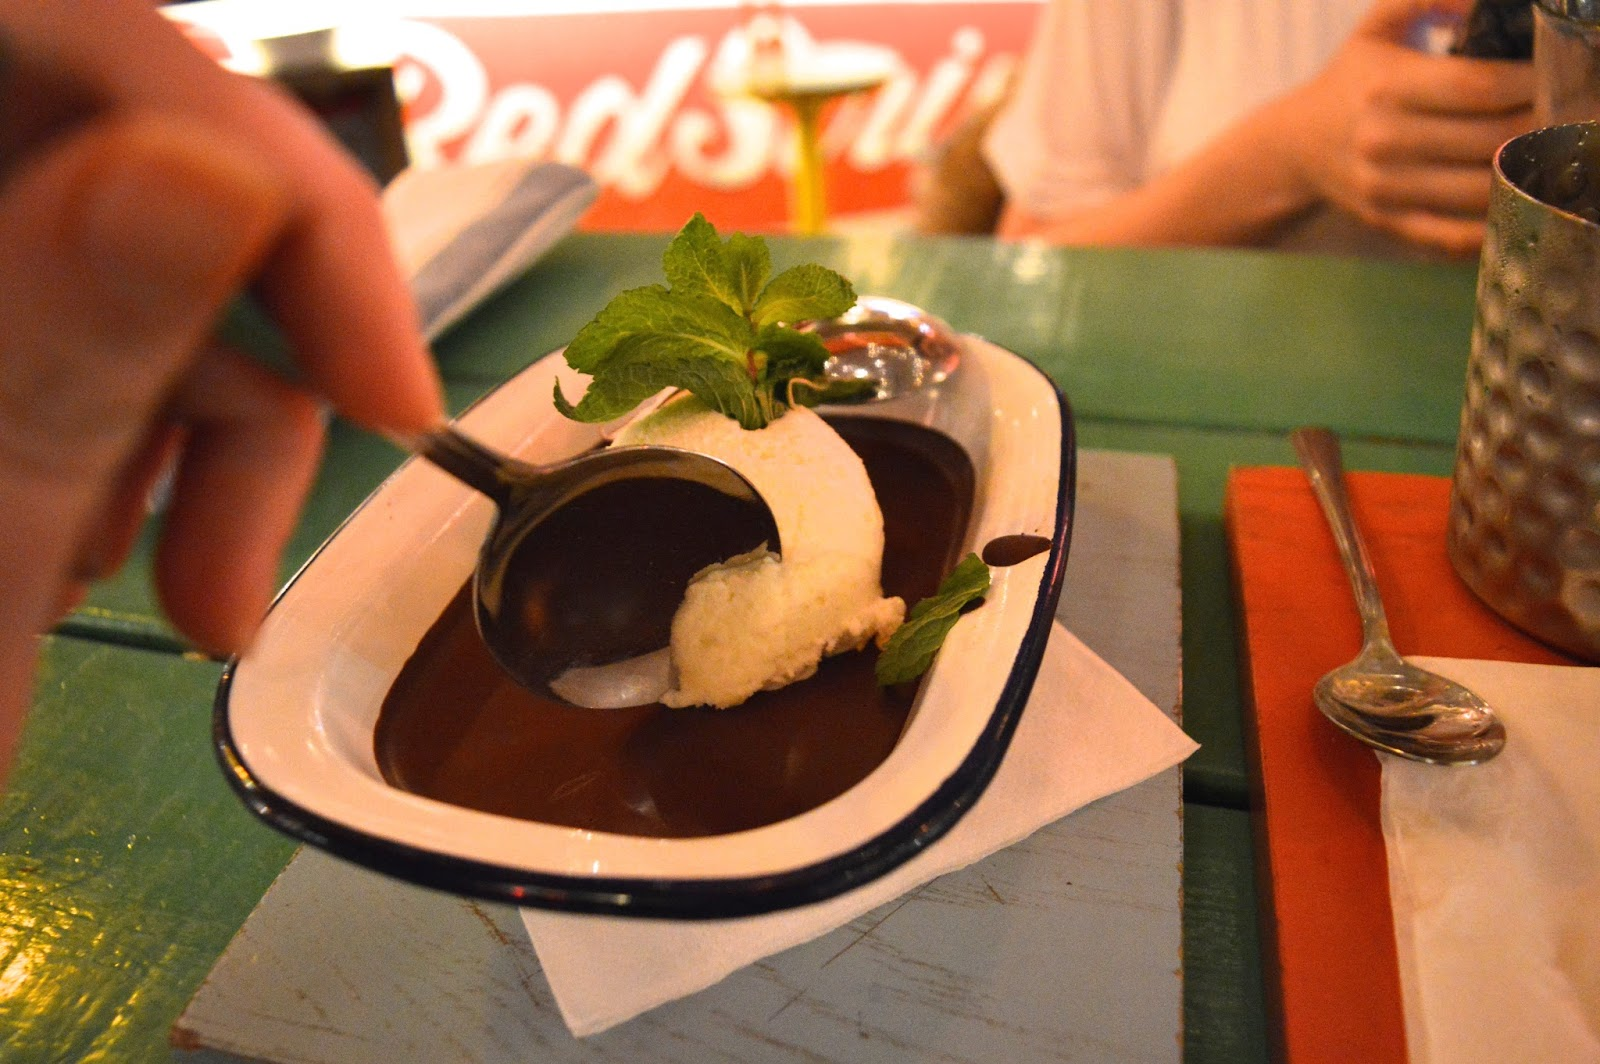 Turtle Bay Southampton review, food bloggers, UK food bloggers, Hampshire bloggers, places to eat Southampton